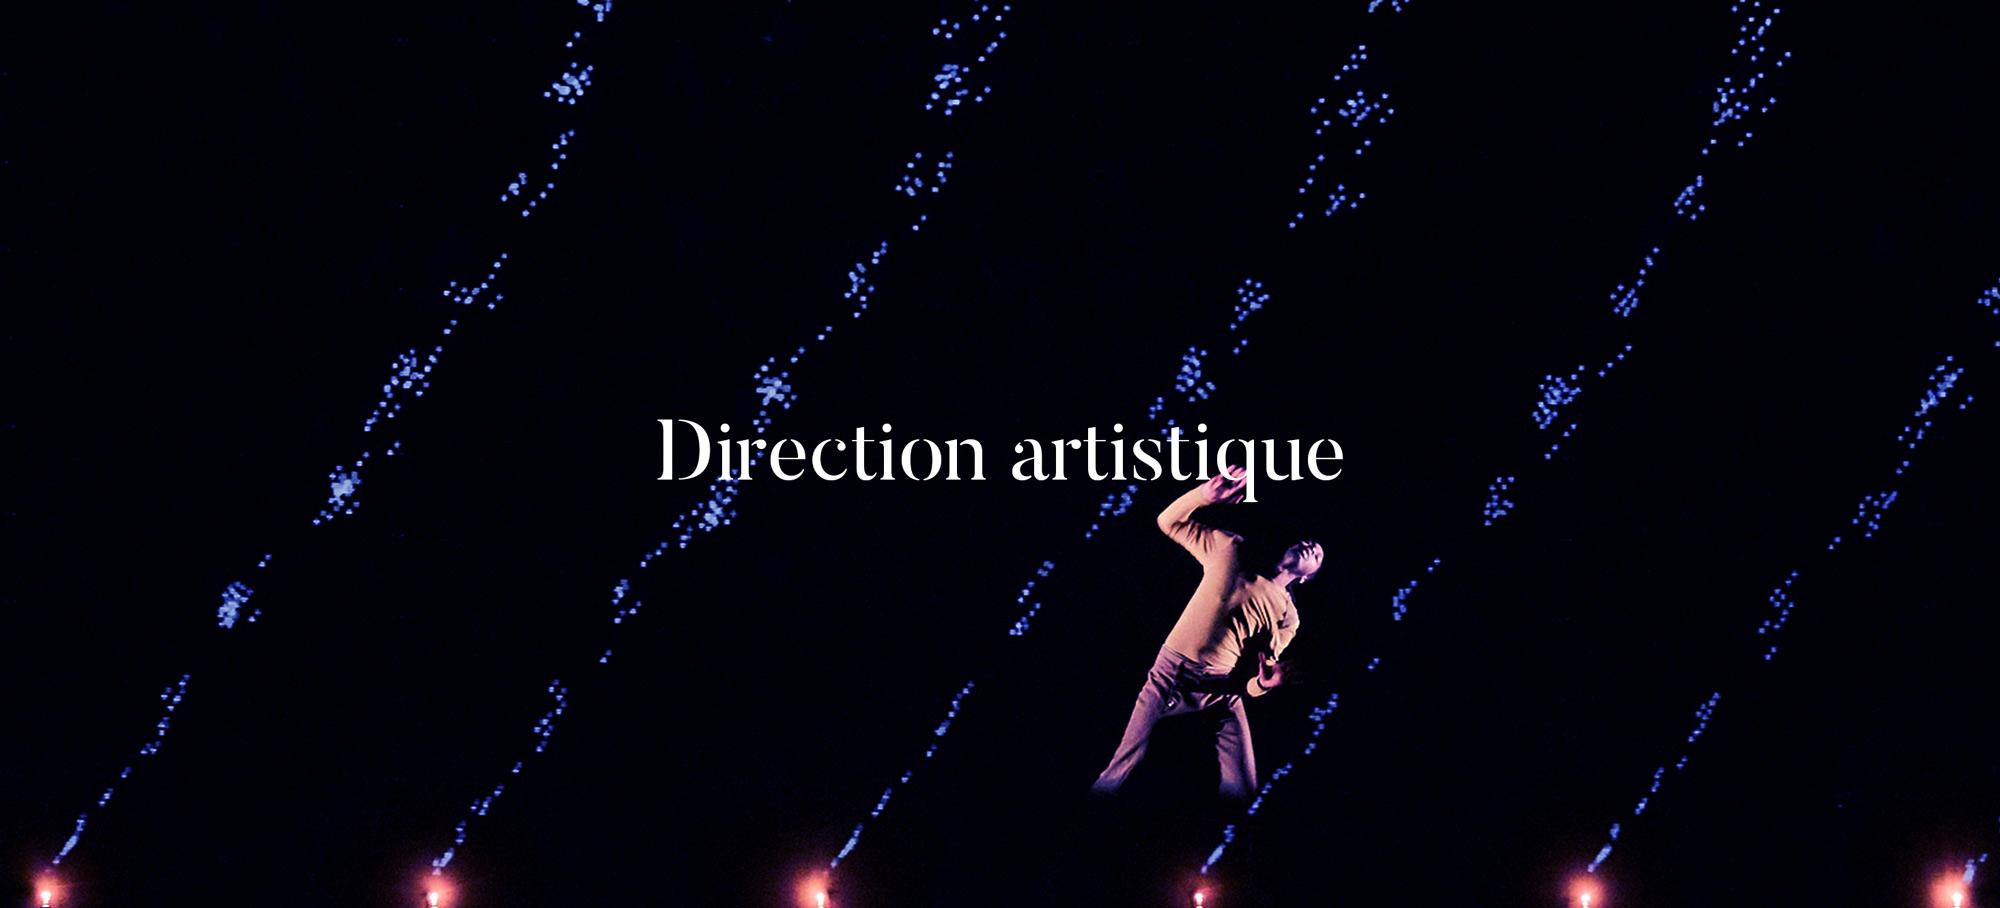 Direction-artistique-mourad-merzouki-agence-ysee